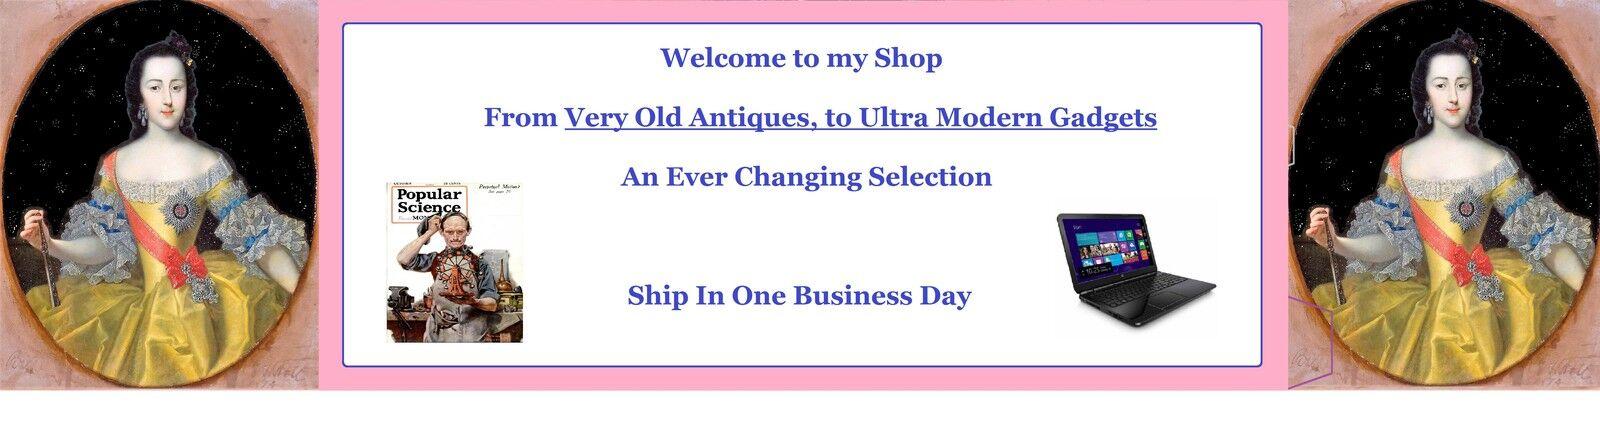 Star Dutchess' Shop